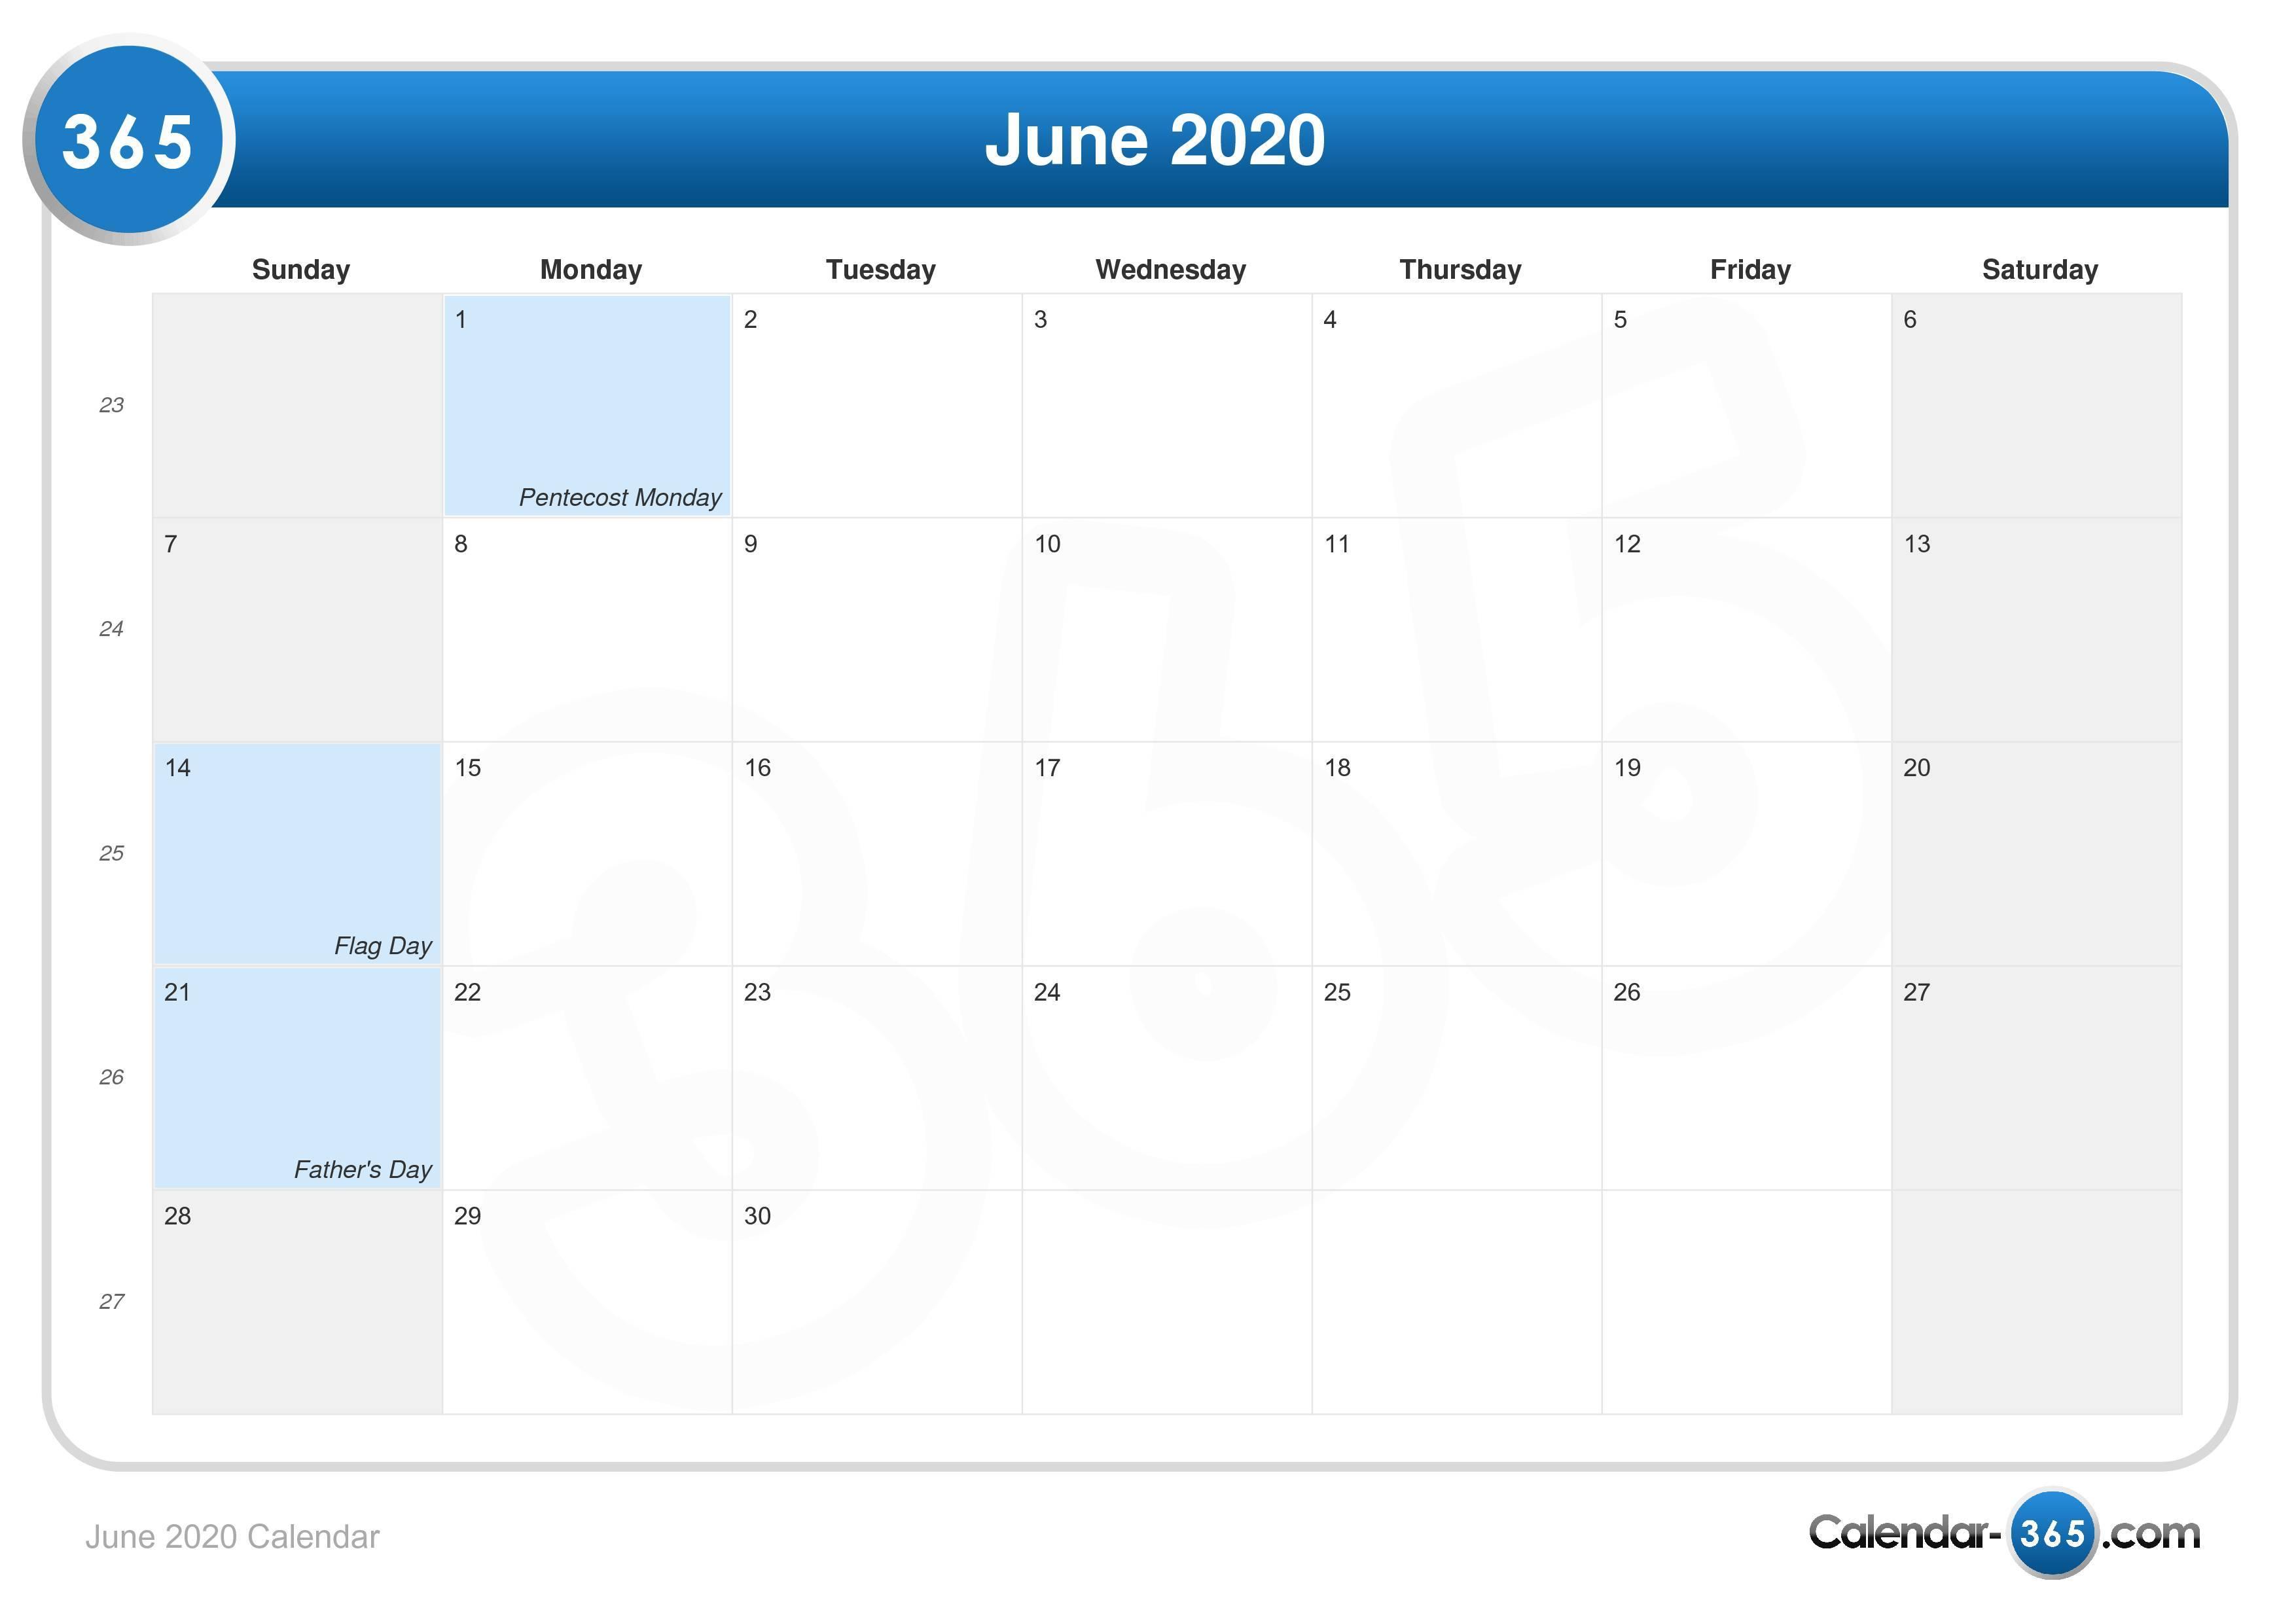 2020 Calendar June June 2020 Calendar